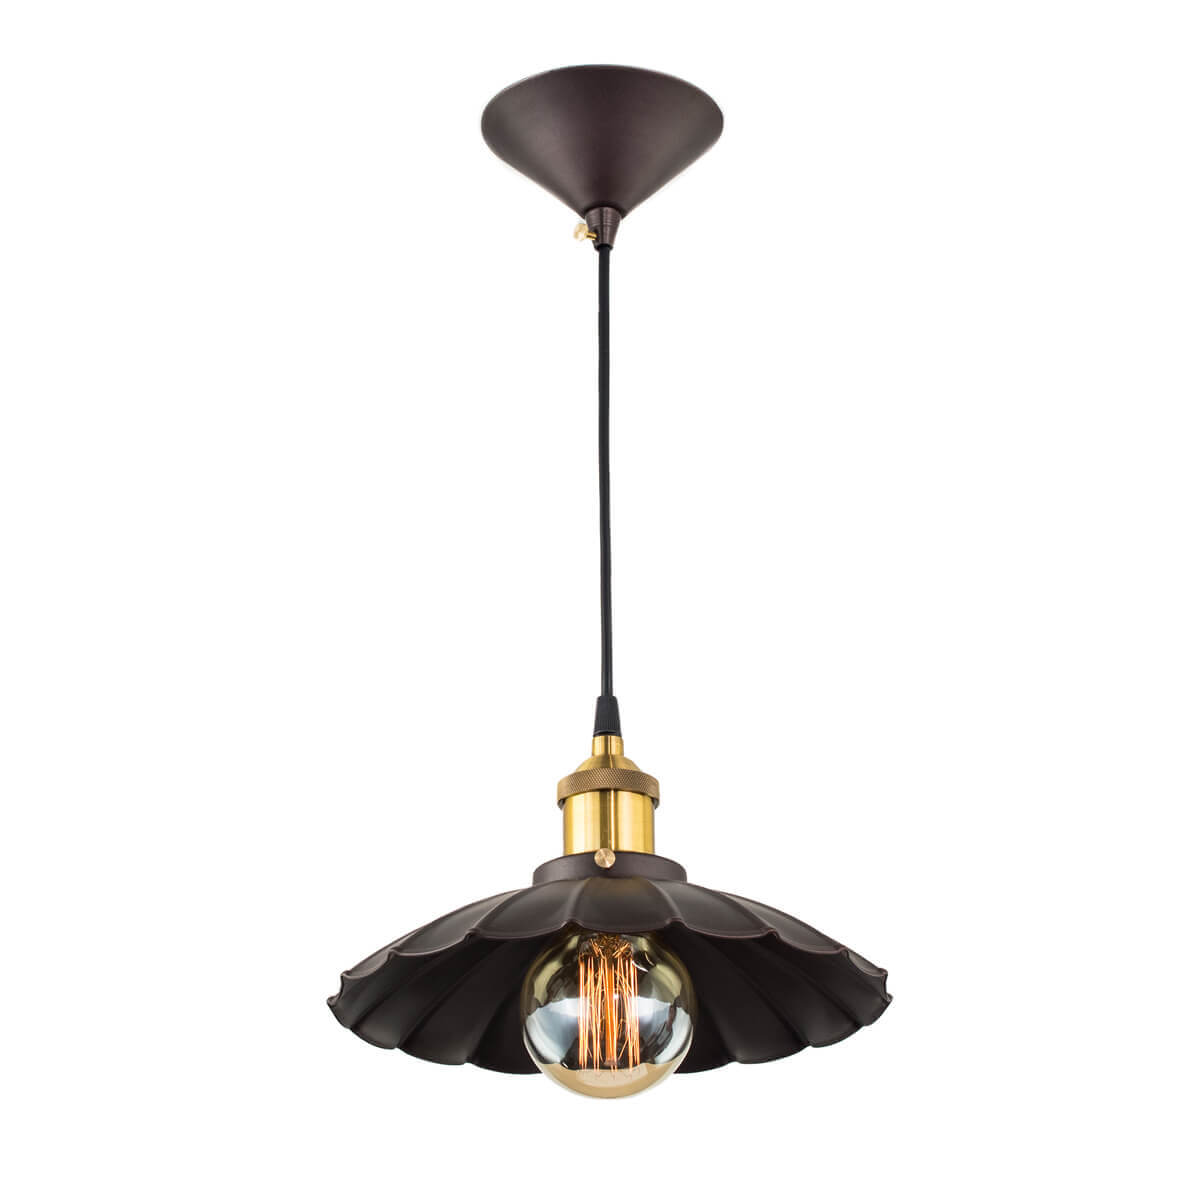 цена на Светильник Citilux CL450104 Эдисон